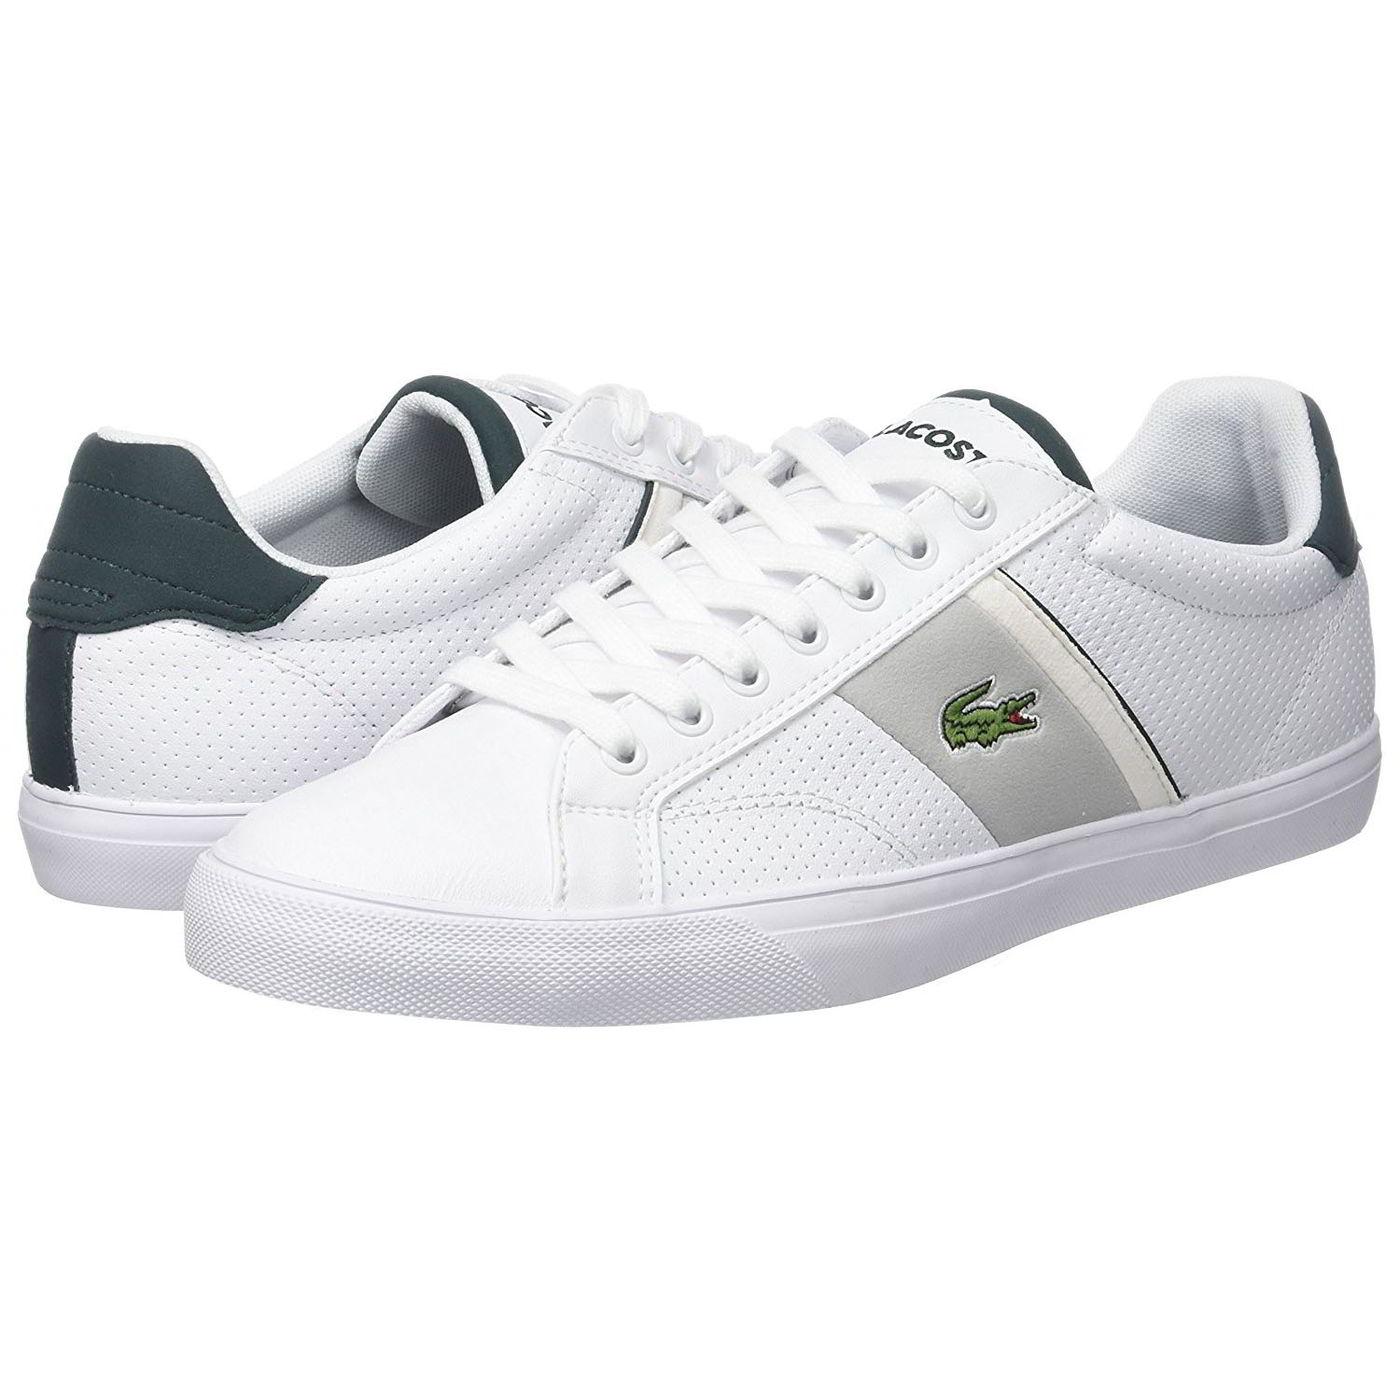 e66f8a2a2b5 Detalles de Lacoste Cornamusa 118 para hombres Cuero Blanco Con Cordones  Zapatillas Zapatos Talla Uk 7-12- ver título original